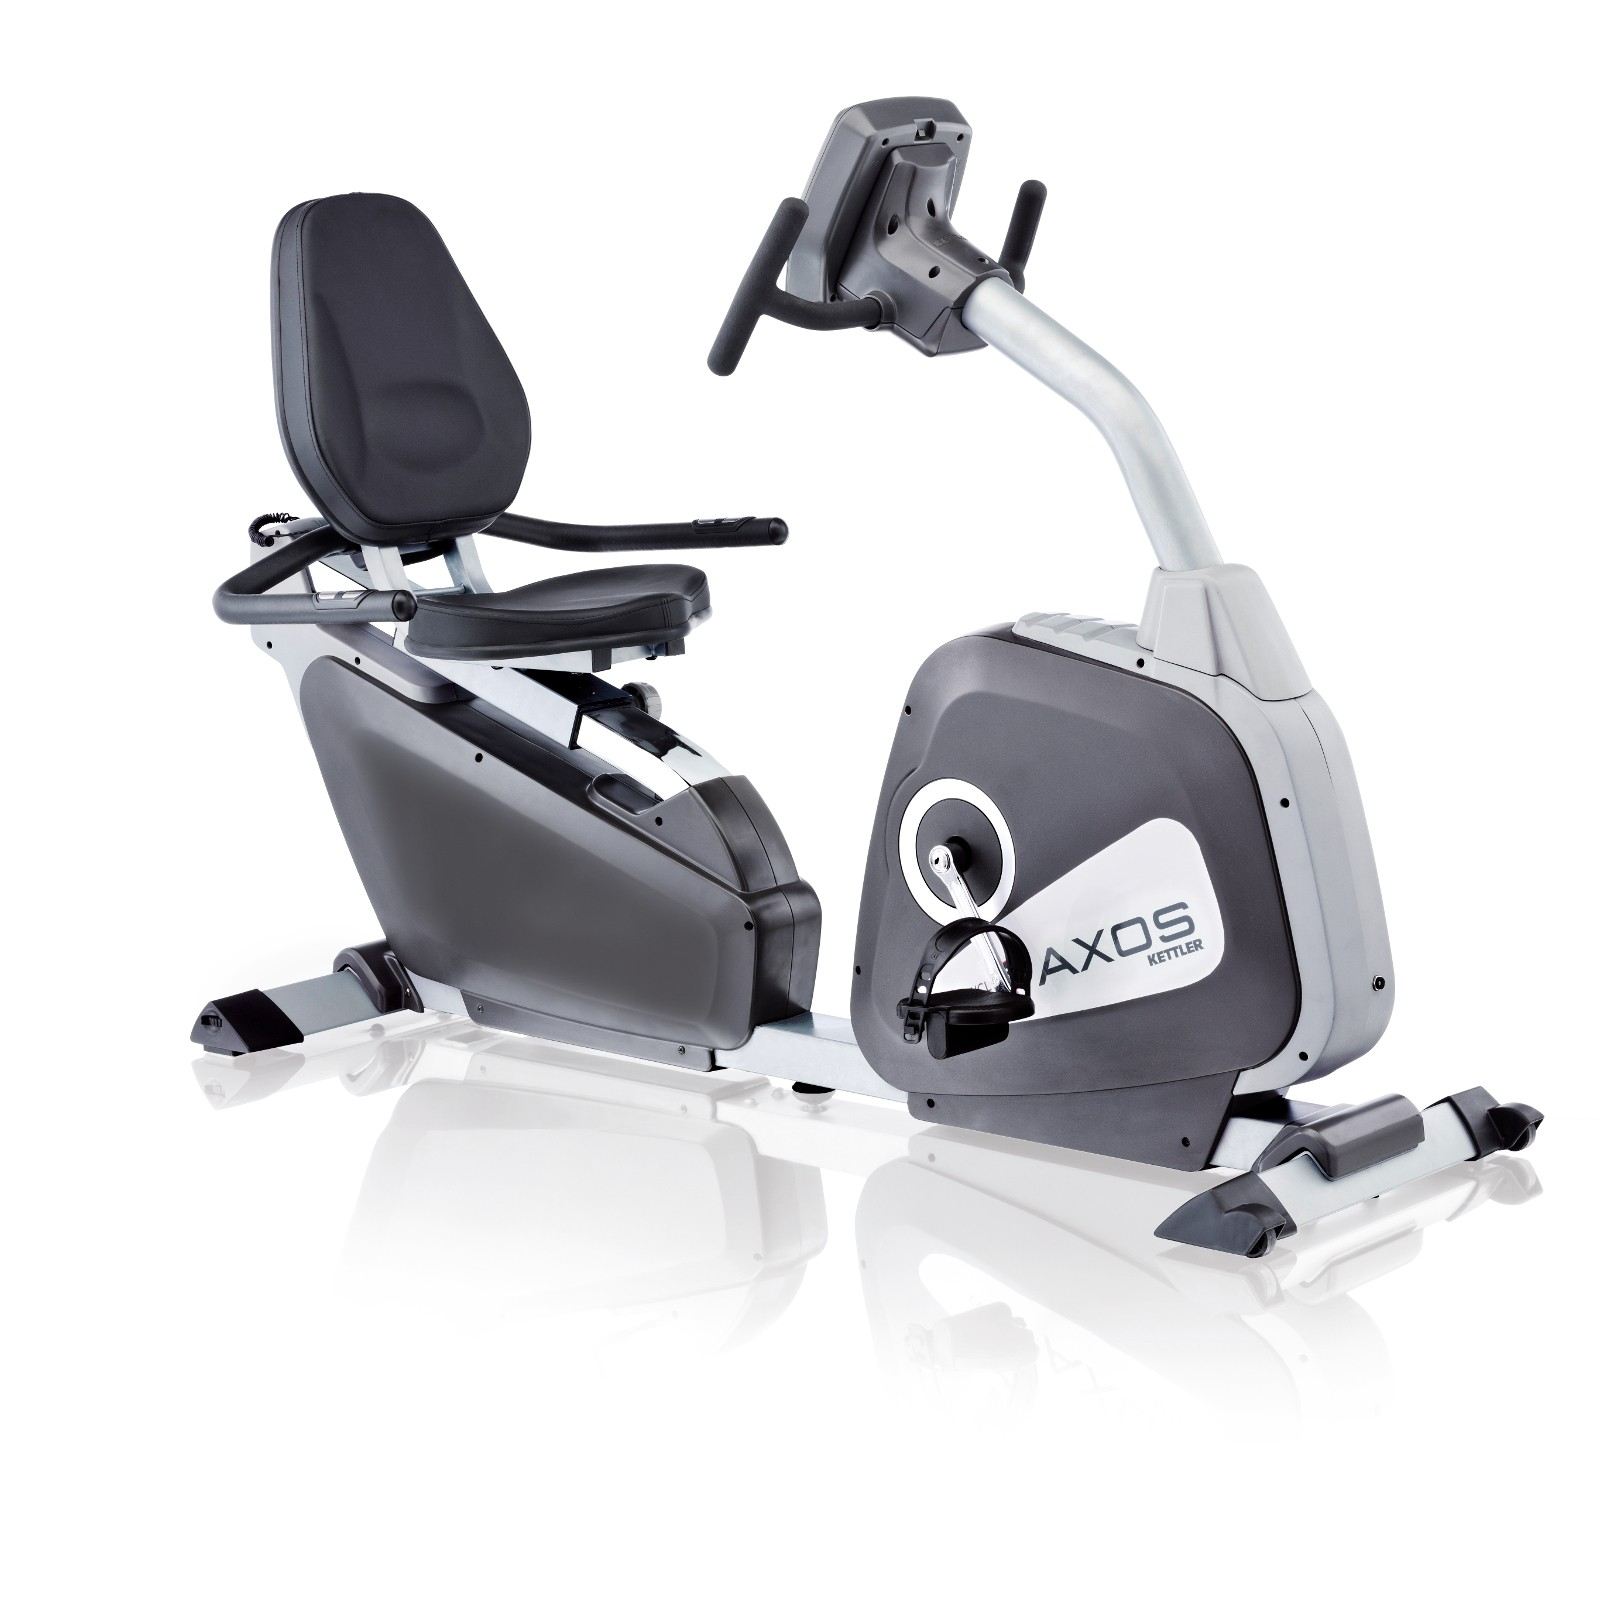 Kettler v lo semi allong axos cycle r acheter avec 21 valuations des client - Velo semi allonge perte de poids ...